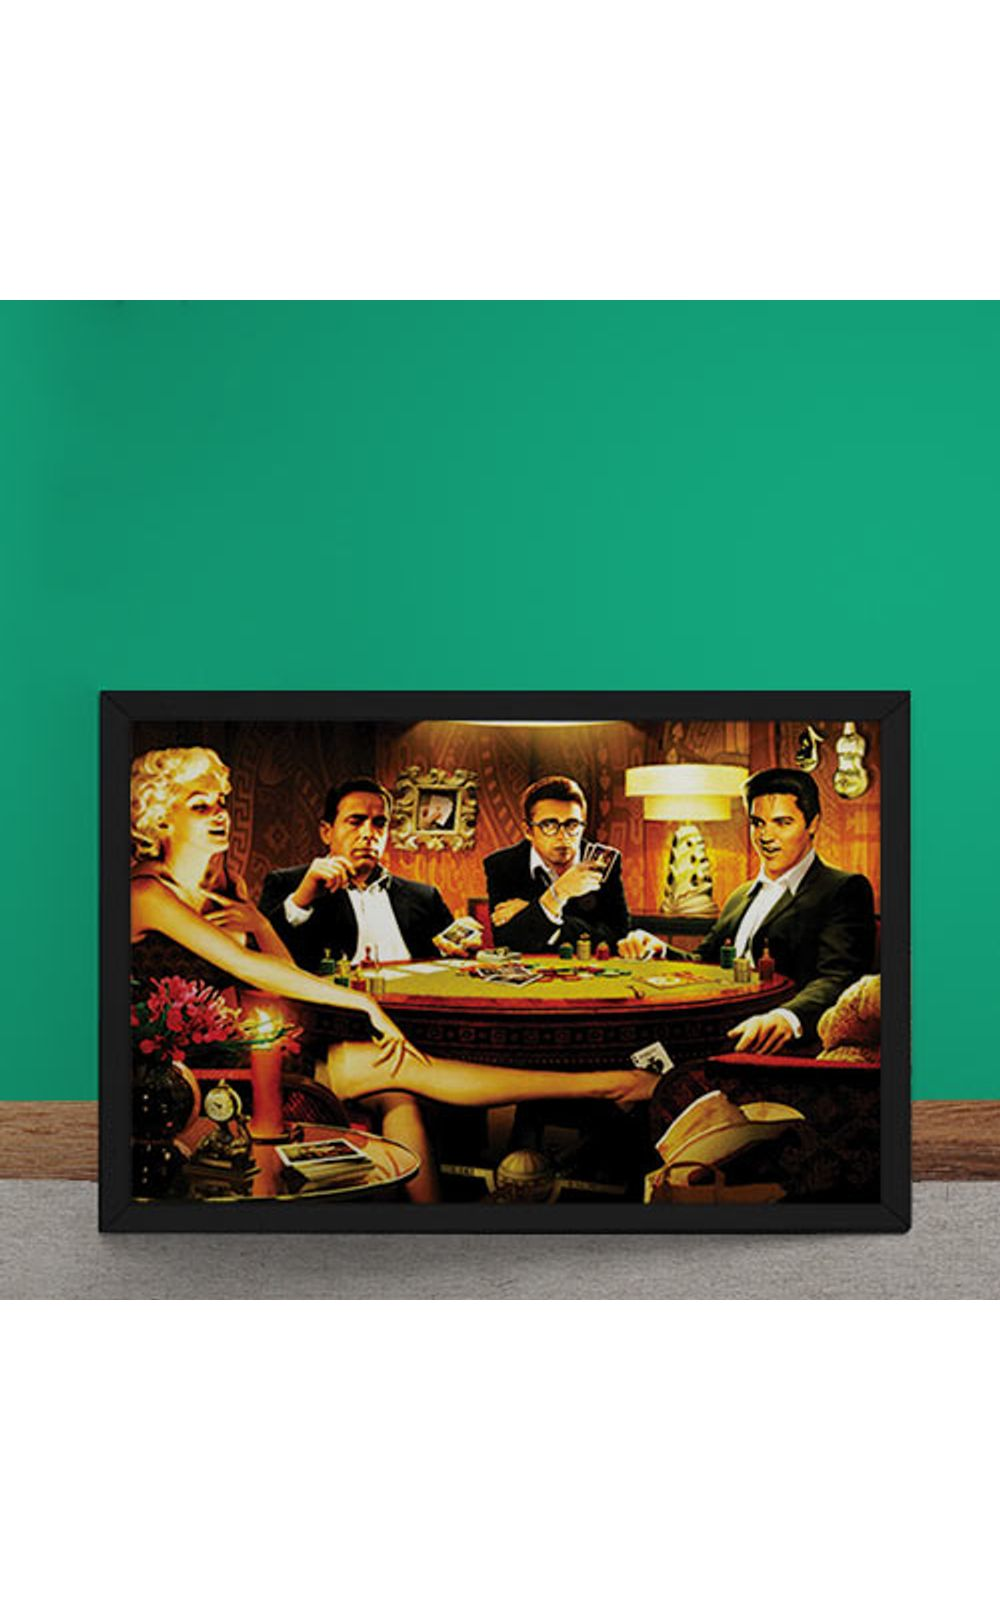 Foto 2 - Quadro Decorativo Baralho Marilyn Monroes Elvis Presley James Dean Humphrey Bogart